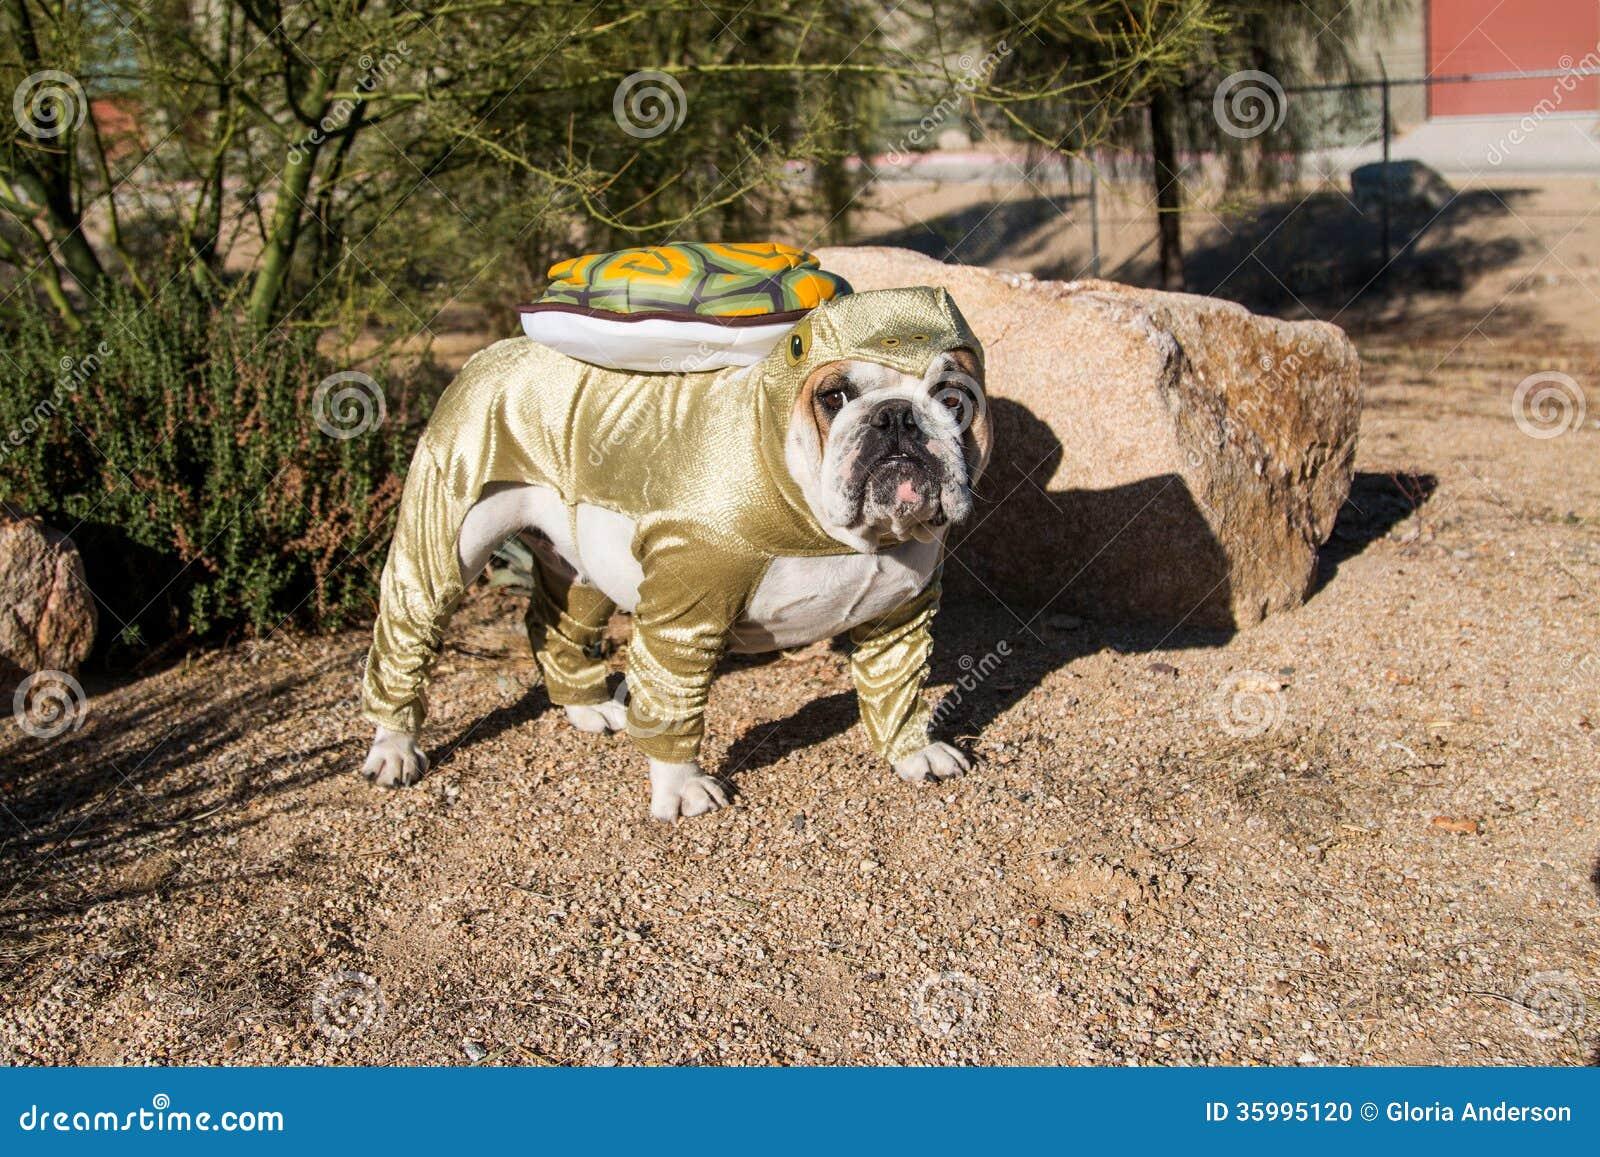 Bulldog posed as a desert tortoise by a rock